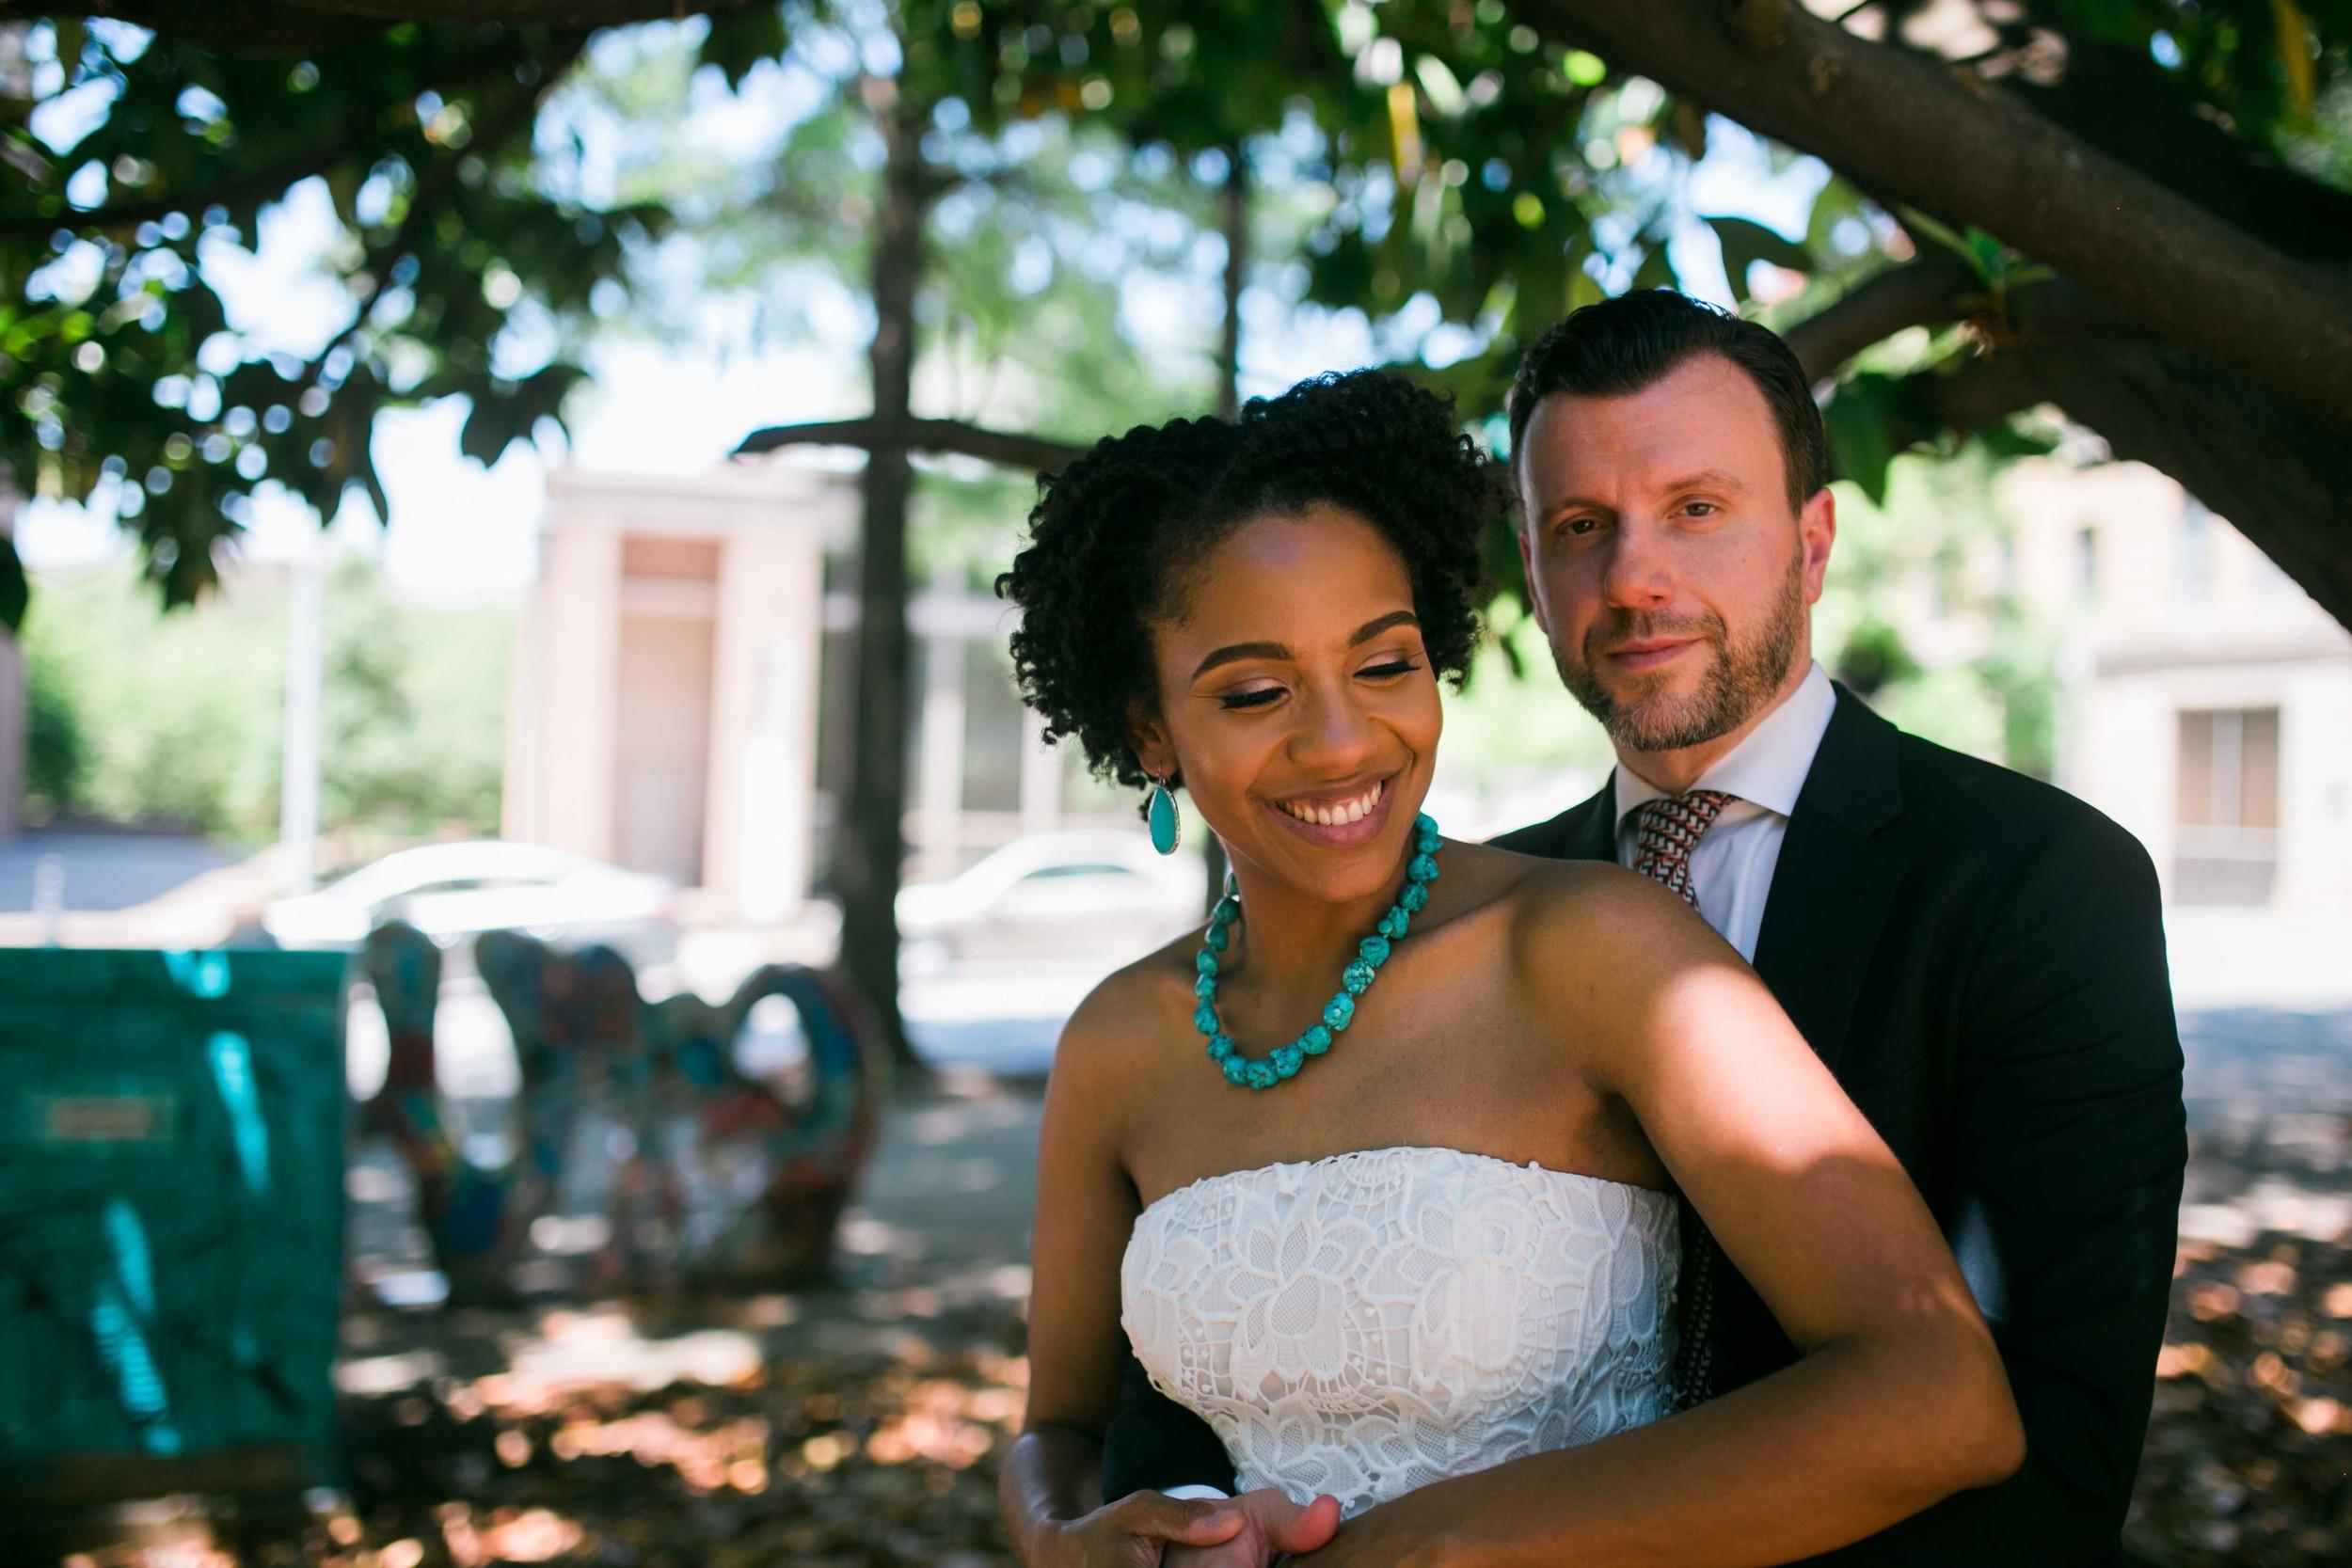 Dekalb-County-Courthouse-Wedding-Photos-Kiyah-C-Photography-49.jpg